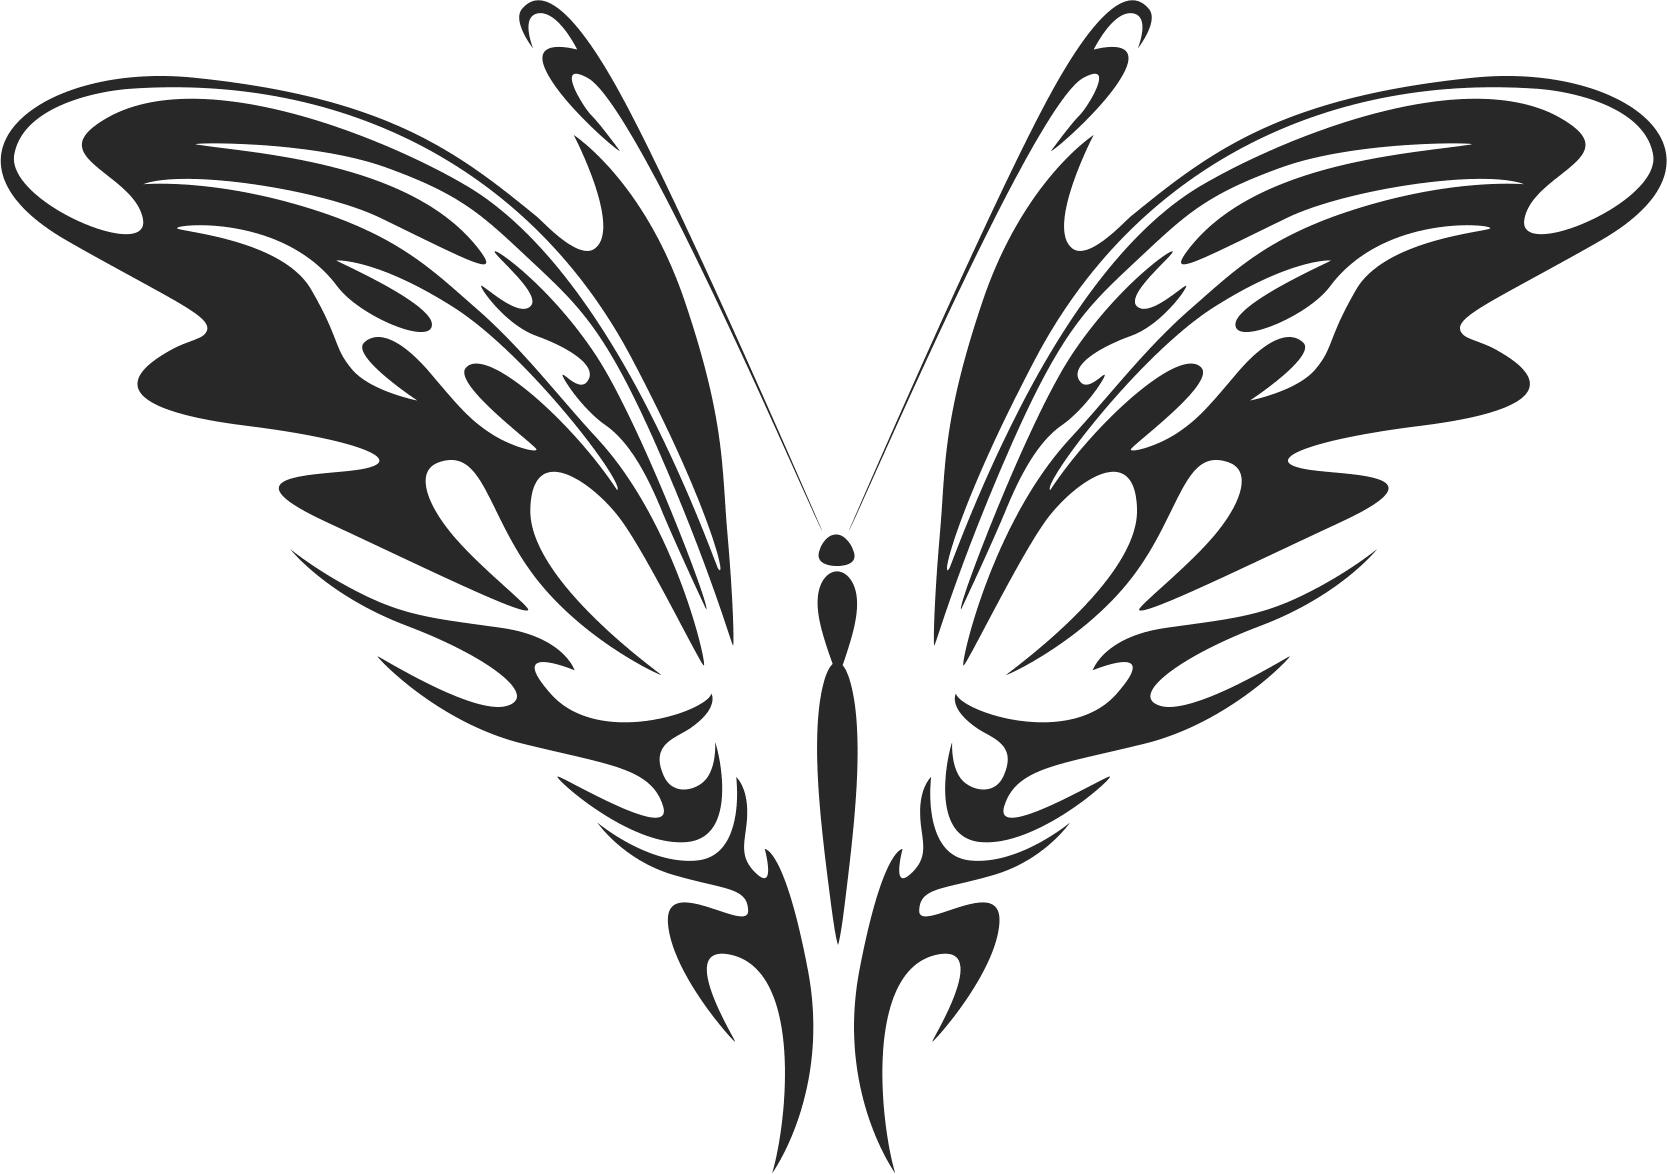 Butterfly Vector Art 026 Free CDR Vectors Art